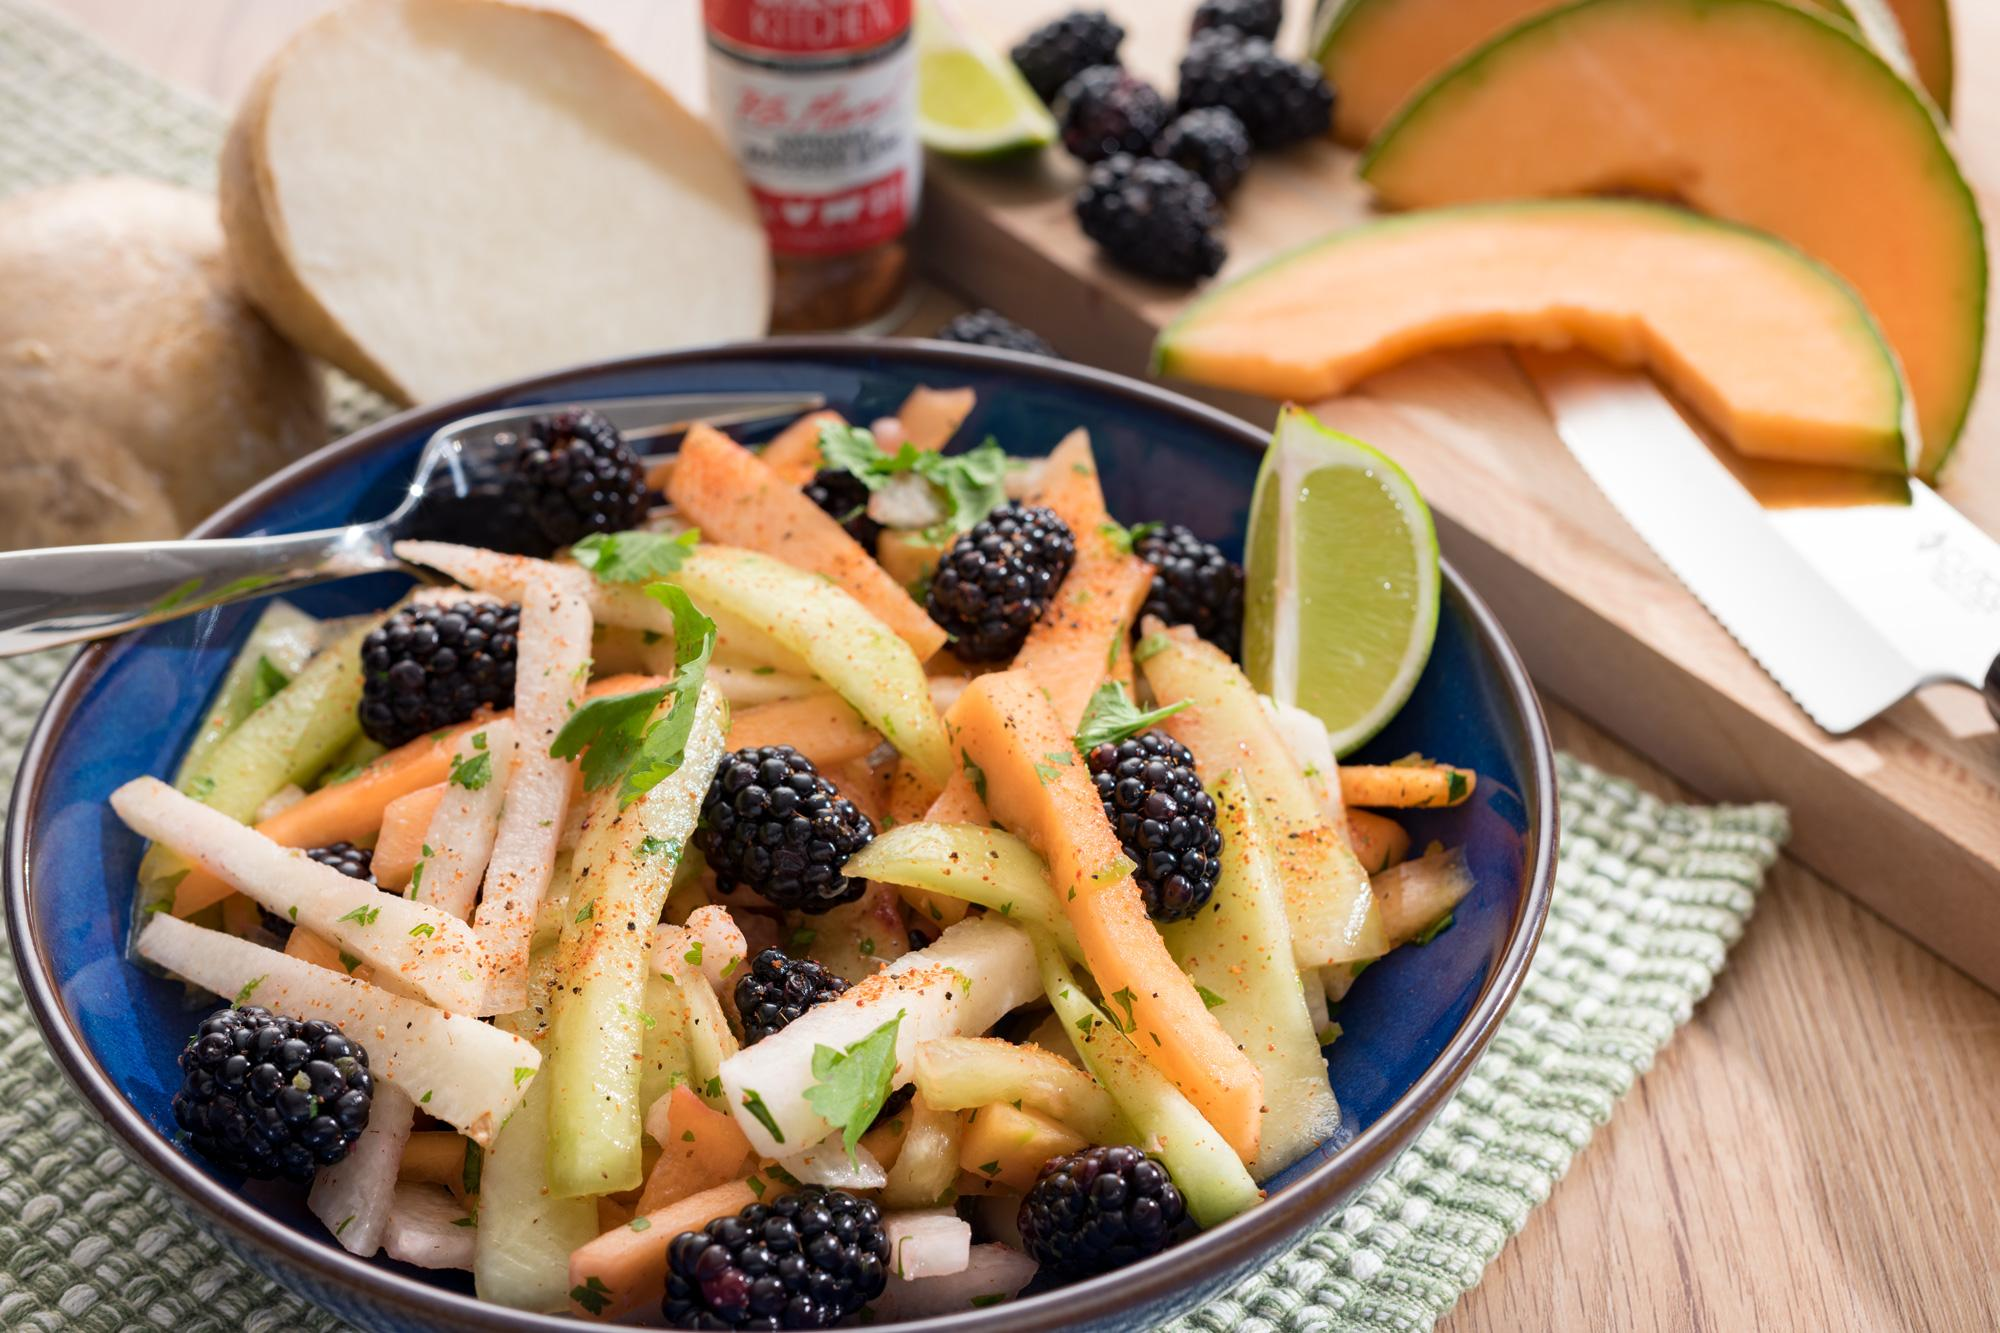 Blackberry, Melon and Jicama Slaw